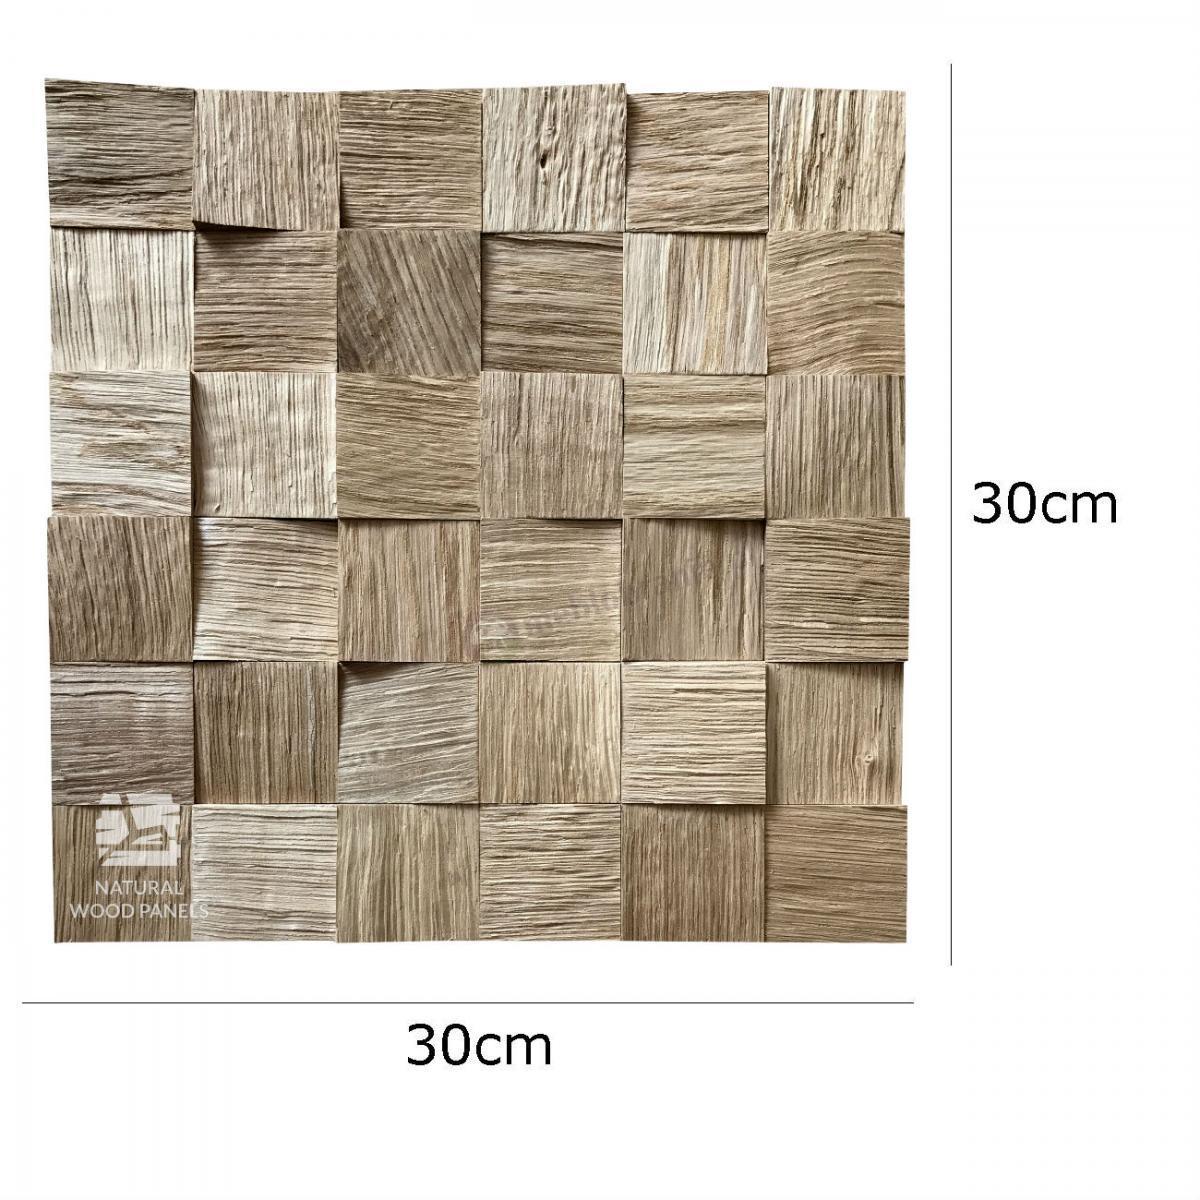 Natural Wood Panels Kostka Łupana DĄB